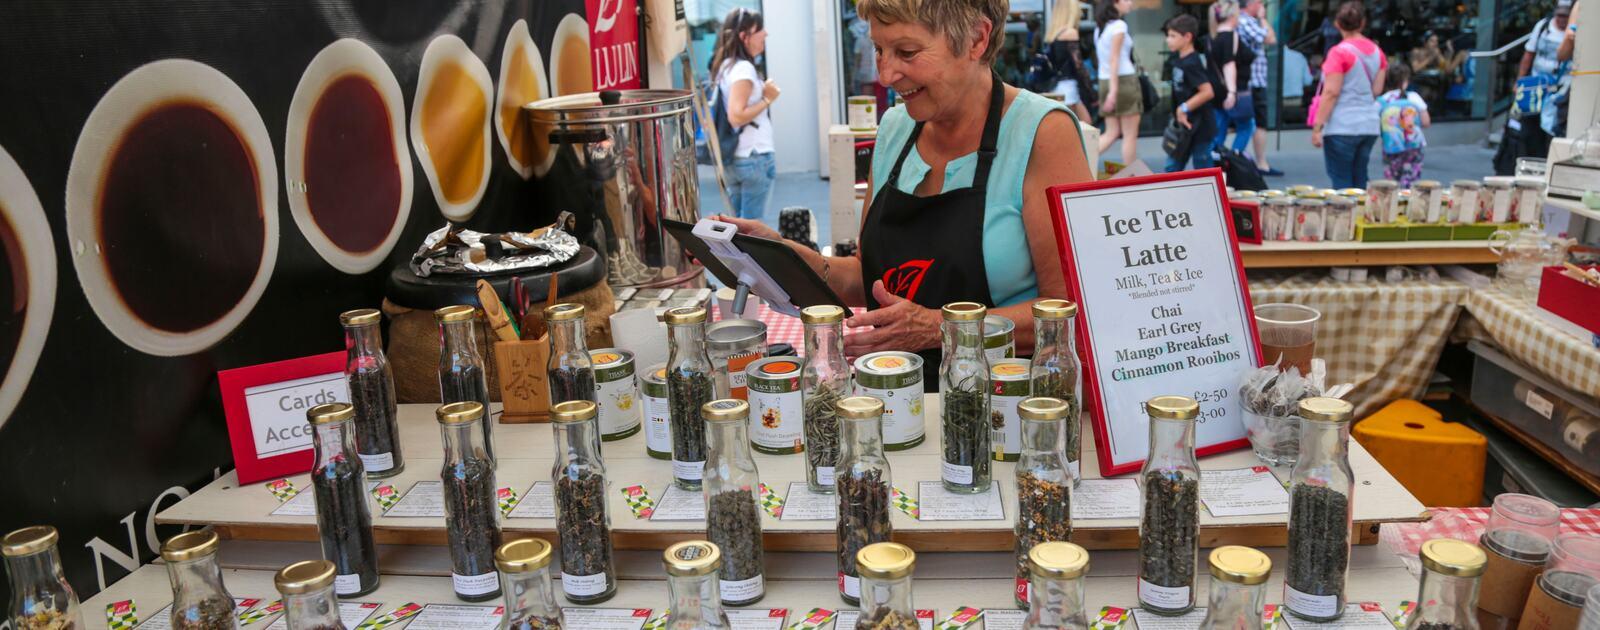 Southbank Centre Food Market.Stall 5 - Lulin Teas & Flower Station.August 2016